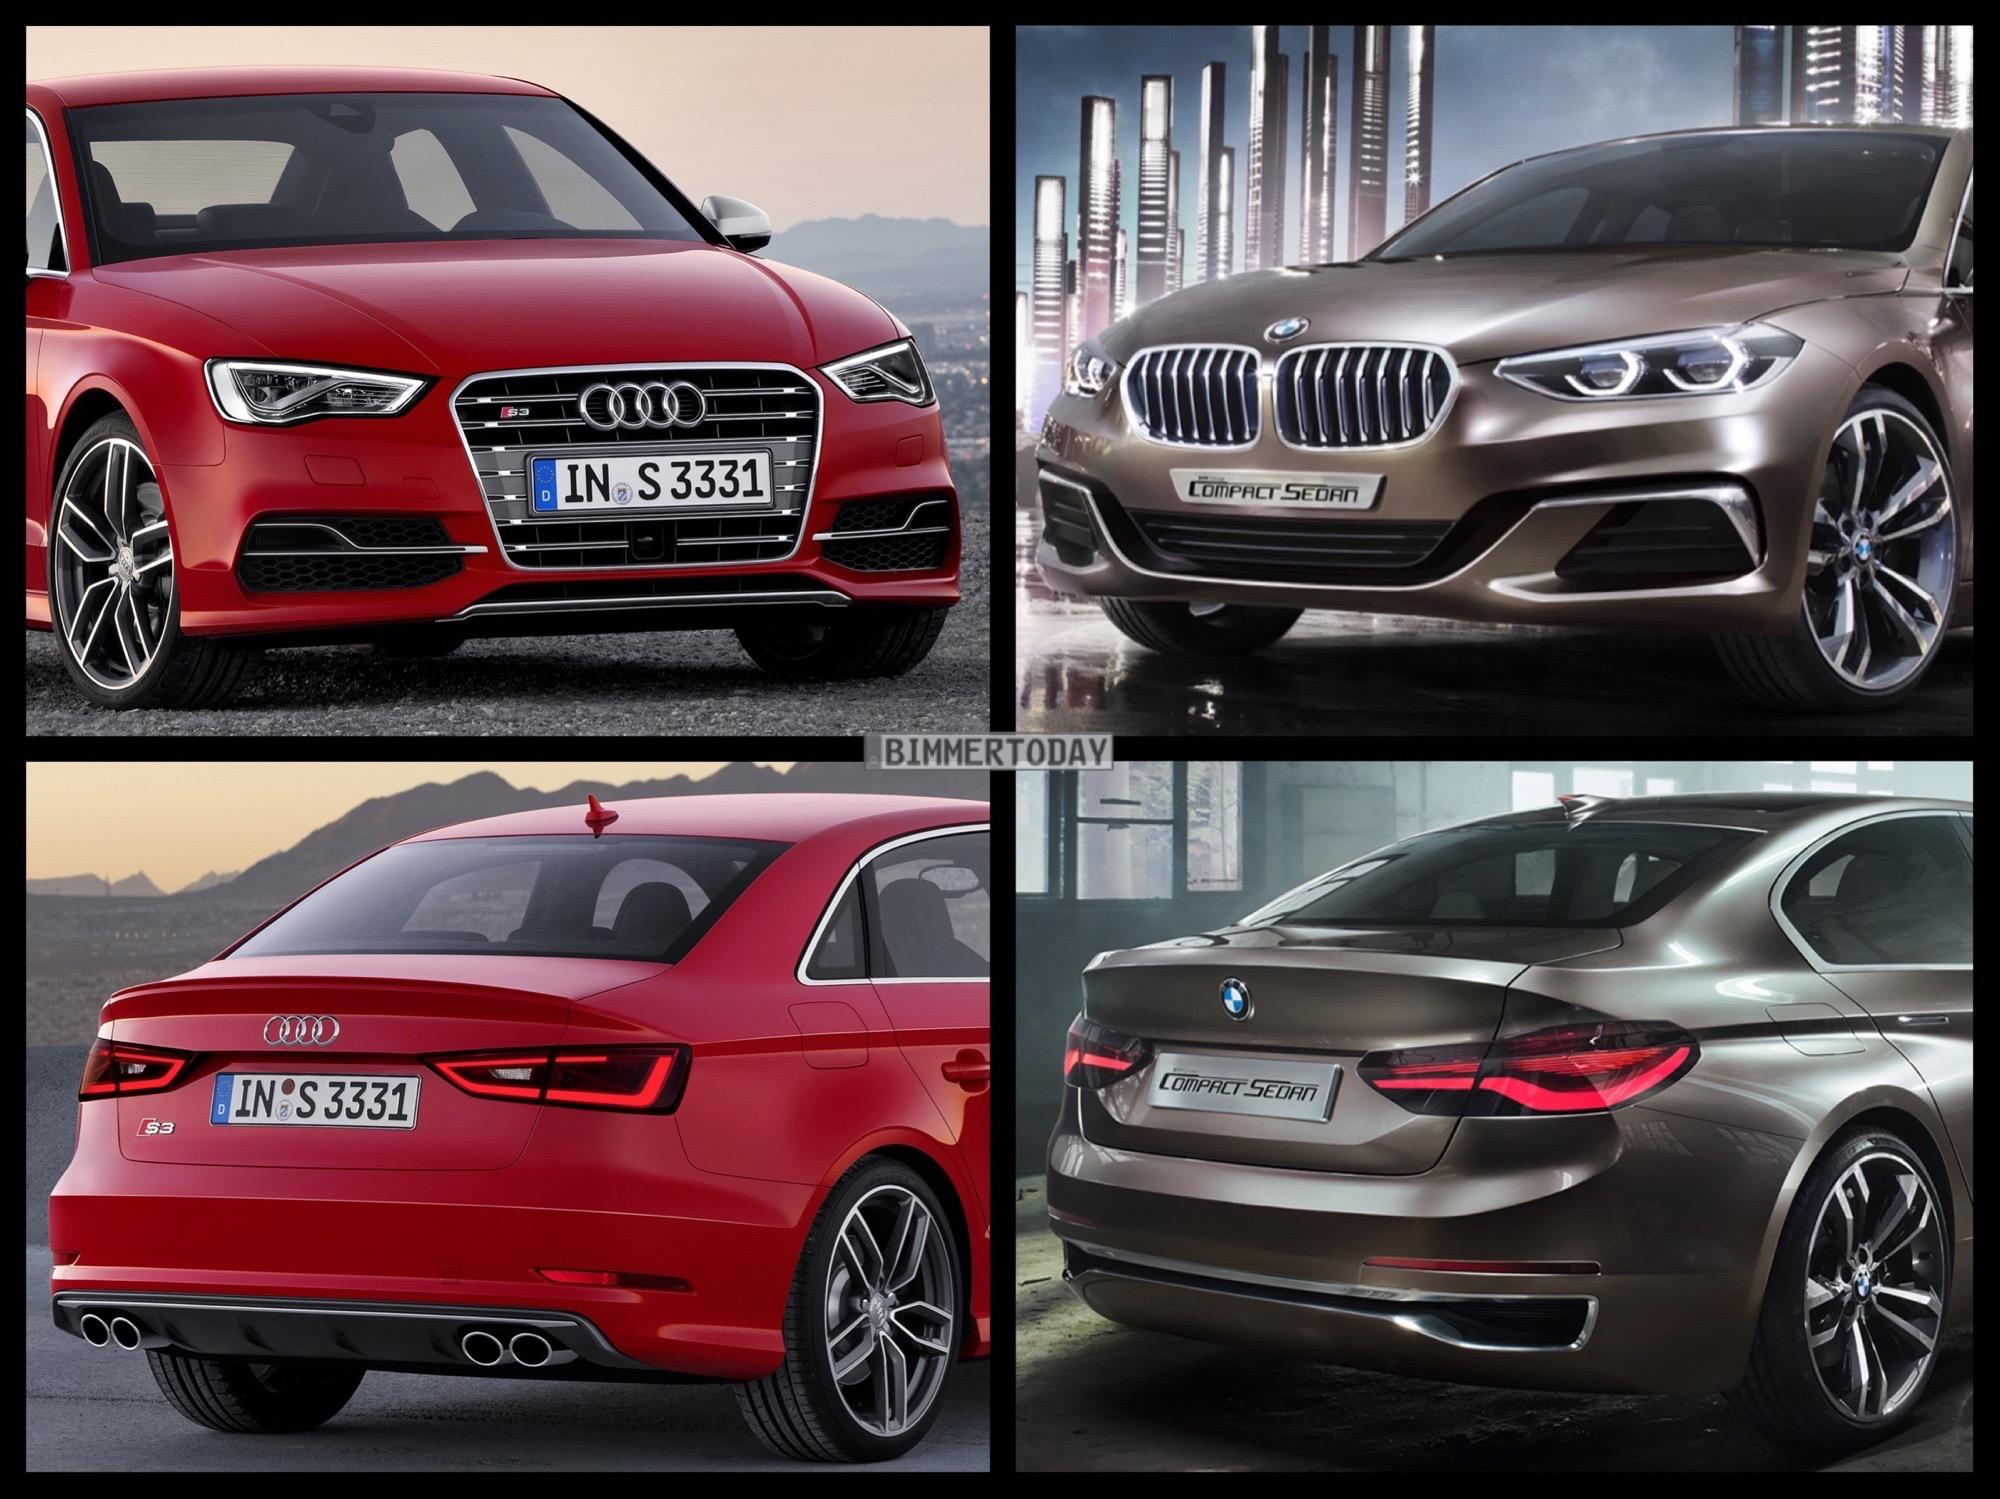 Bild Vergleich BMW Compact Sedan Concept 1er F52 Audi S3 Limousine 2015 01